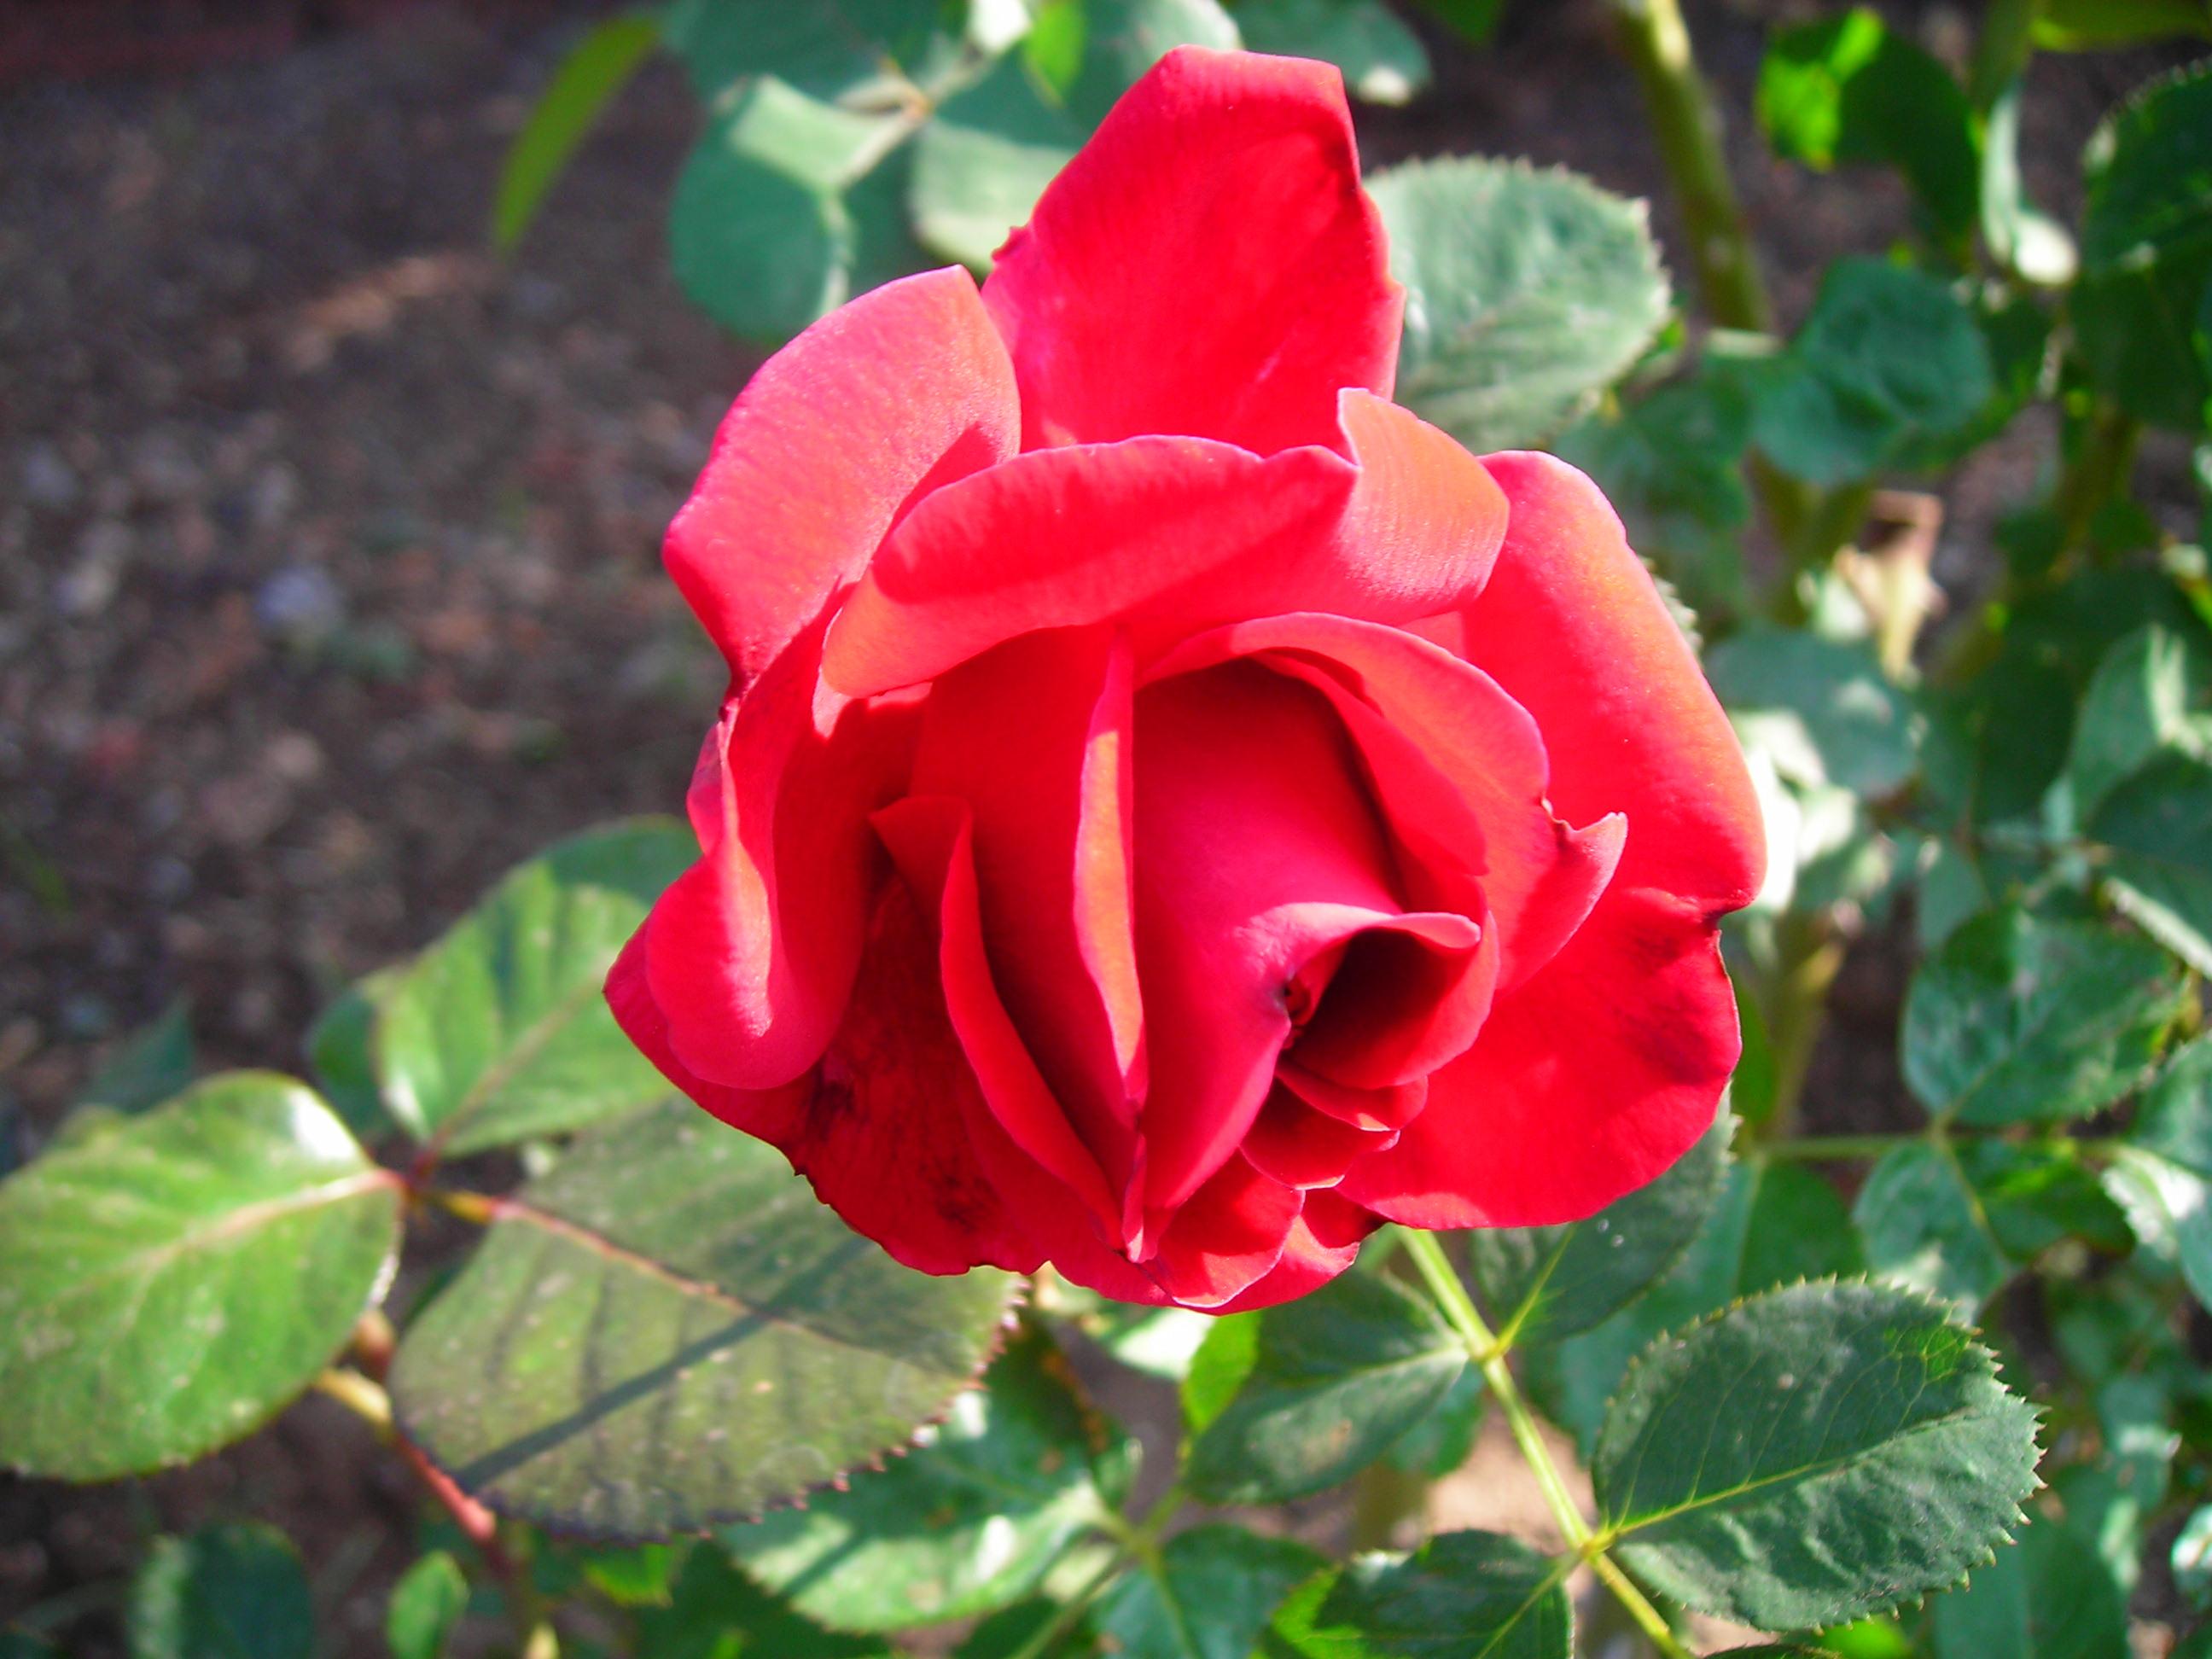 File:Red rose.JPG - Wikipedia